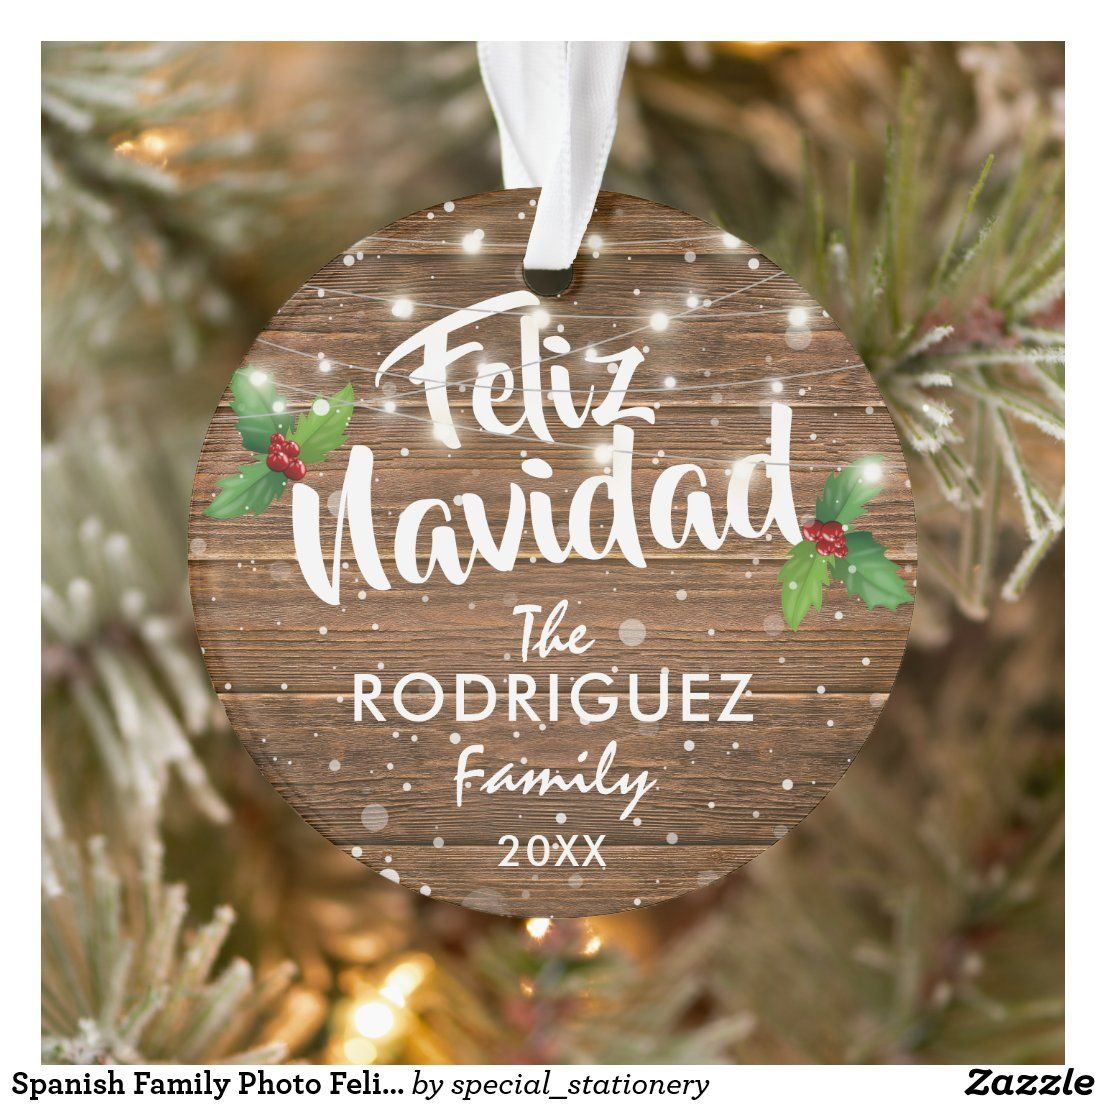 Spanish Family Photo Feliz Navidad Ornament Zazzle Com In 2020 Photo Christmas Ornaments First Christmas Photos Photo Ornaments